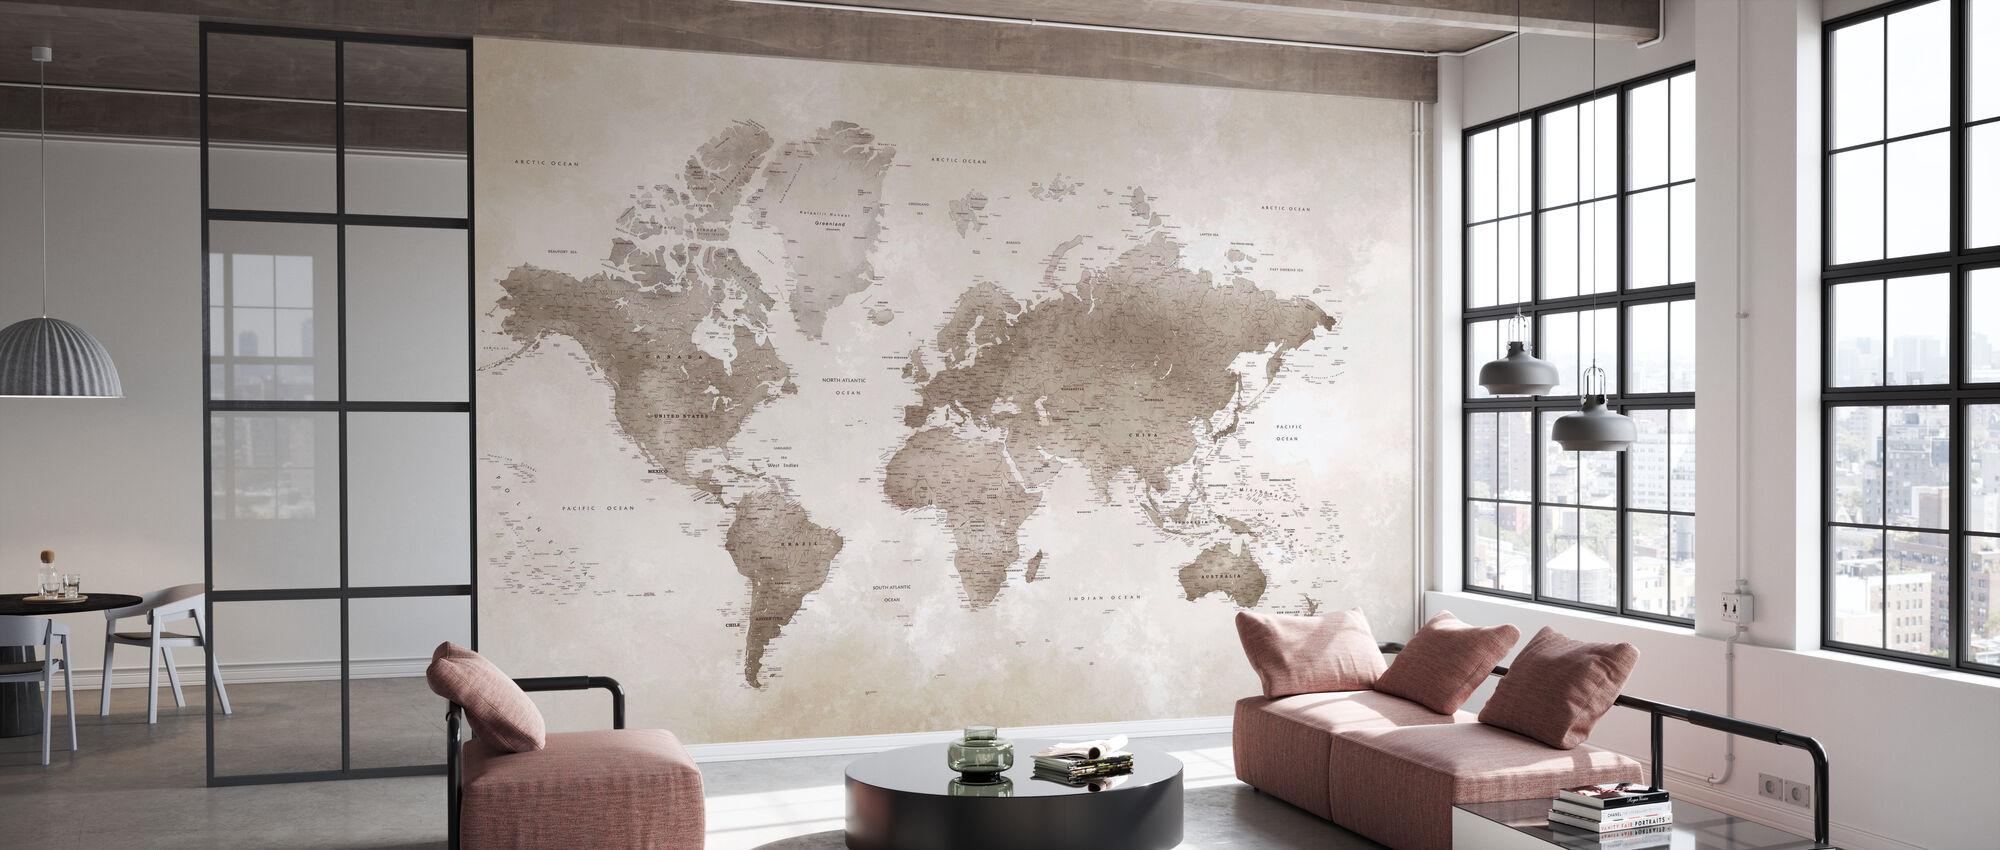 World Map - Sepia - Wallpaper - Office